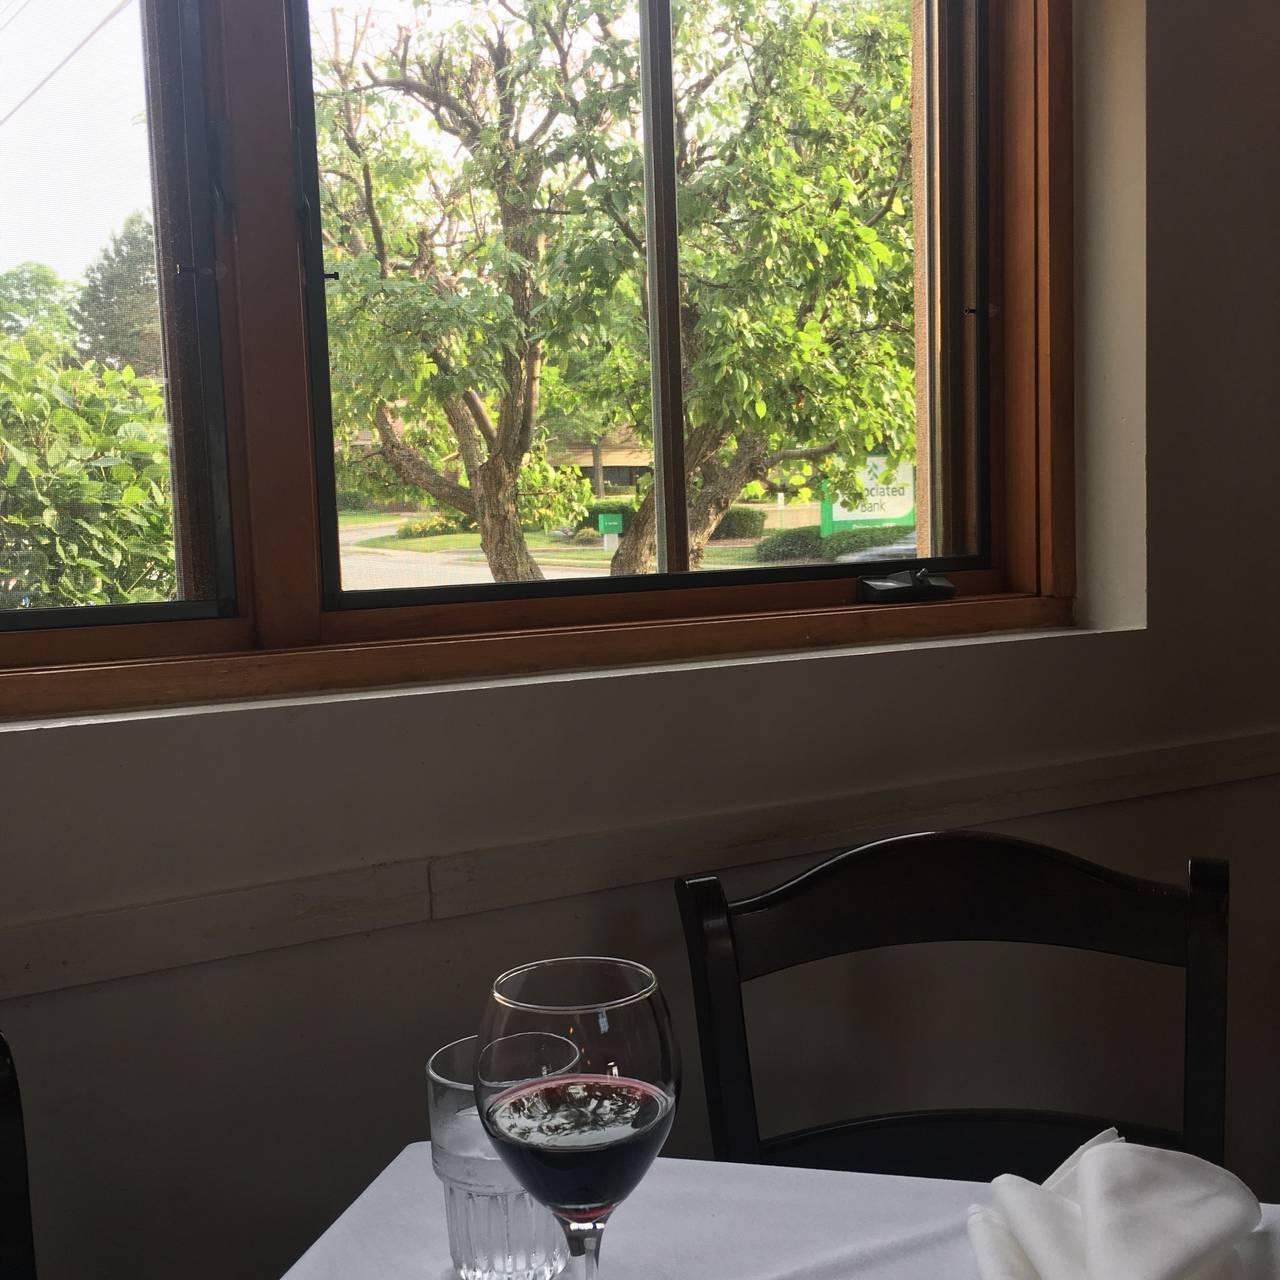 Ristorante Bottaio Restaurant Libertyville Il Opentable